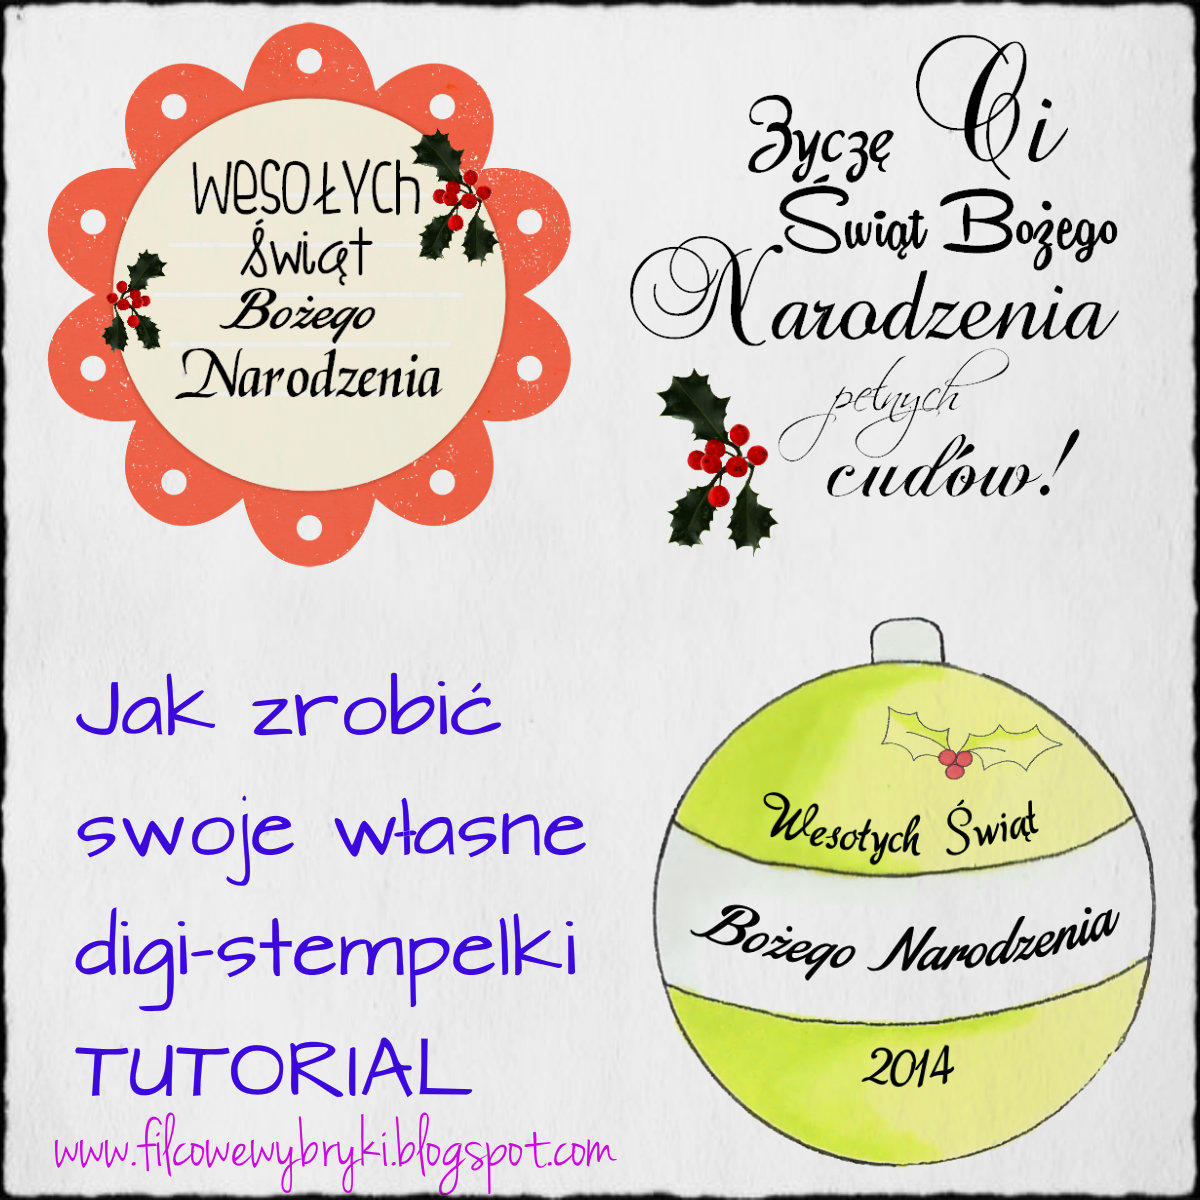 http://filcowewybryki.blogspot.co.uk/2014/11/digi-tutorial-stempelki-na-boze.html